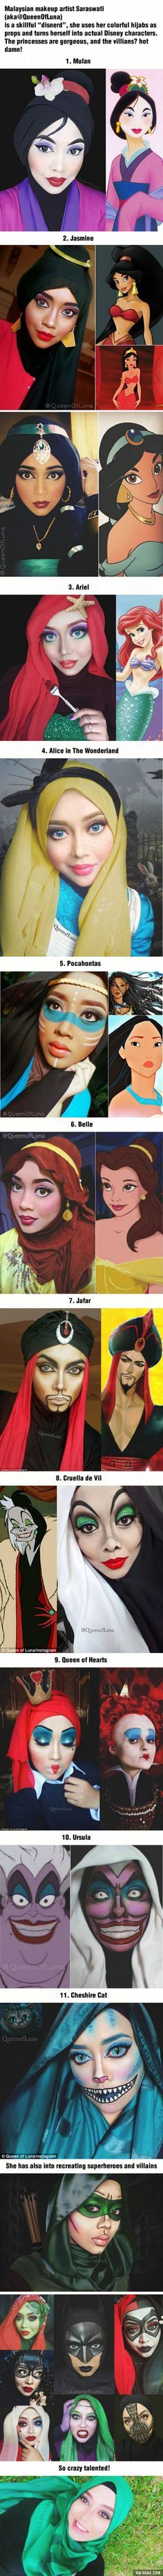 Malaysian Makeup Artist Transforms Into Stunning Disney Characters Using Her Hijab - wooooow